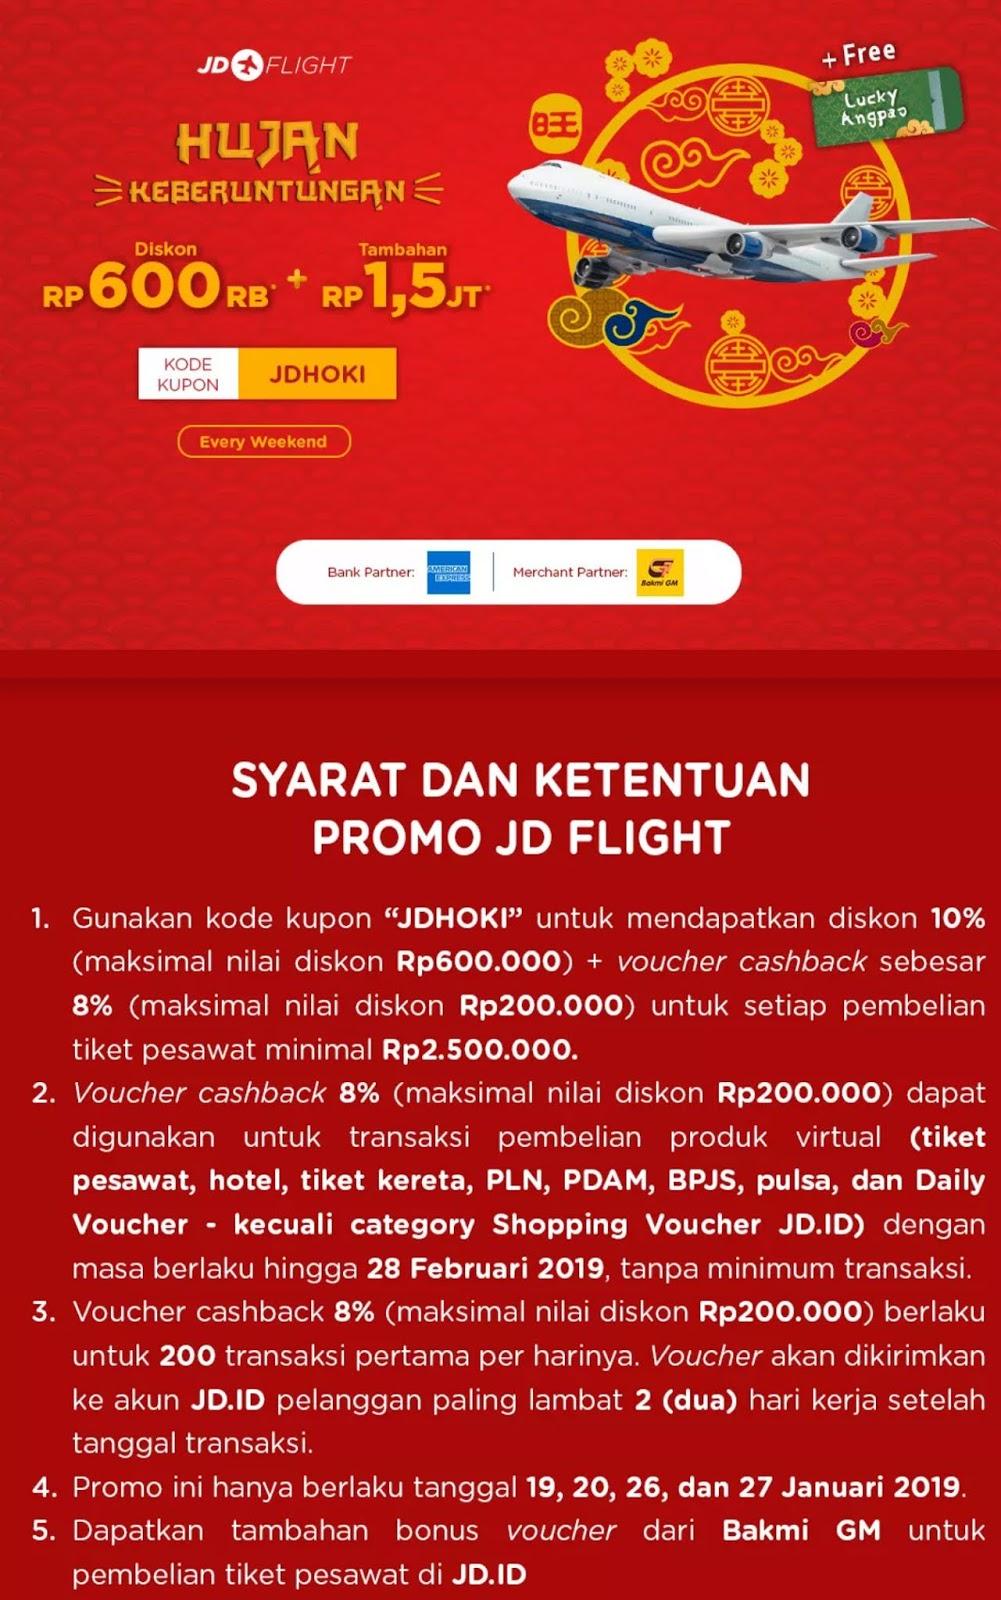 #JDID - #Promo Voucher Diskon 600K Tiket Pesawat + Free Lucky Angpao (s.d 27 Jan 2019)